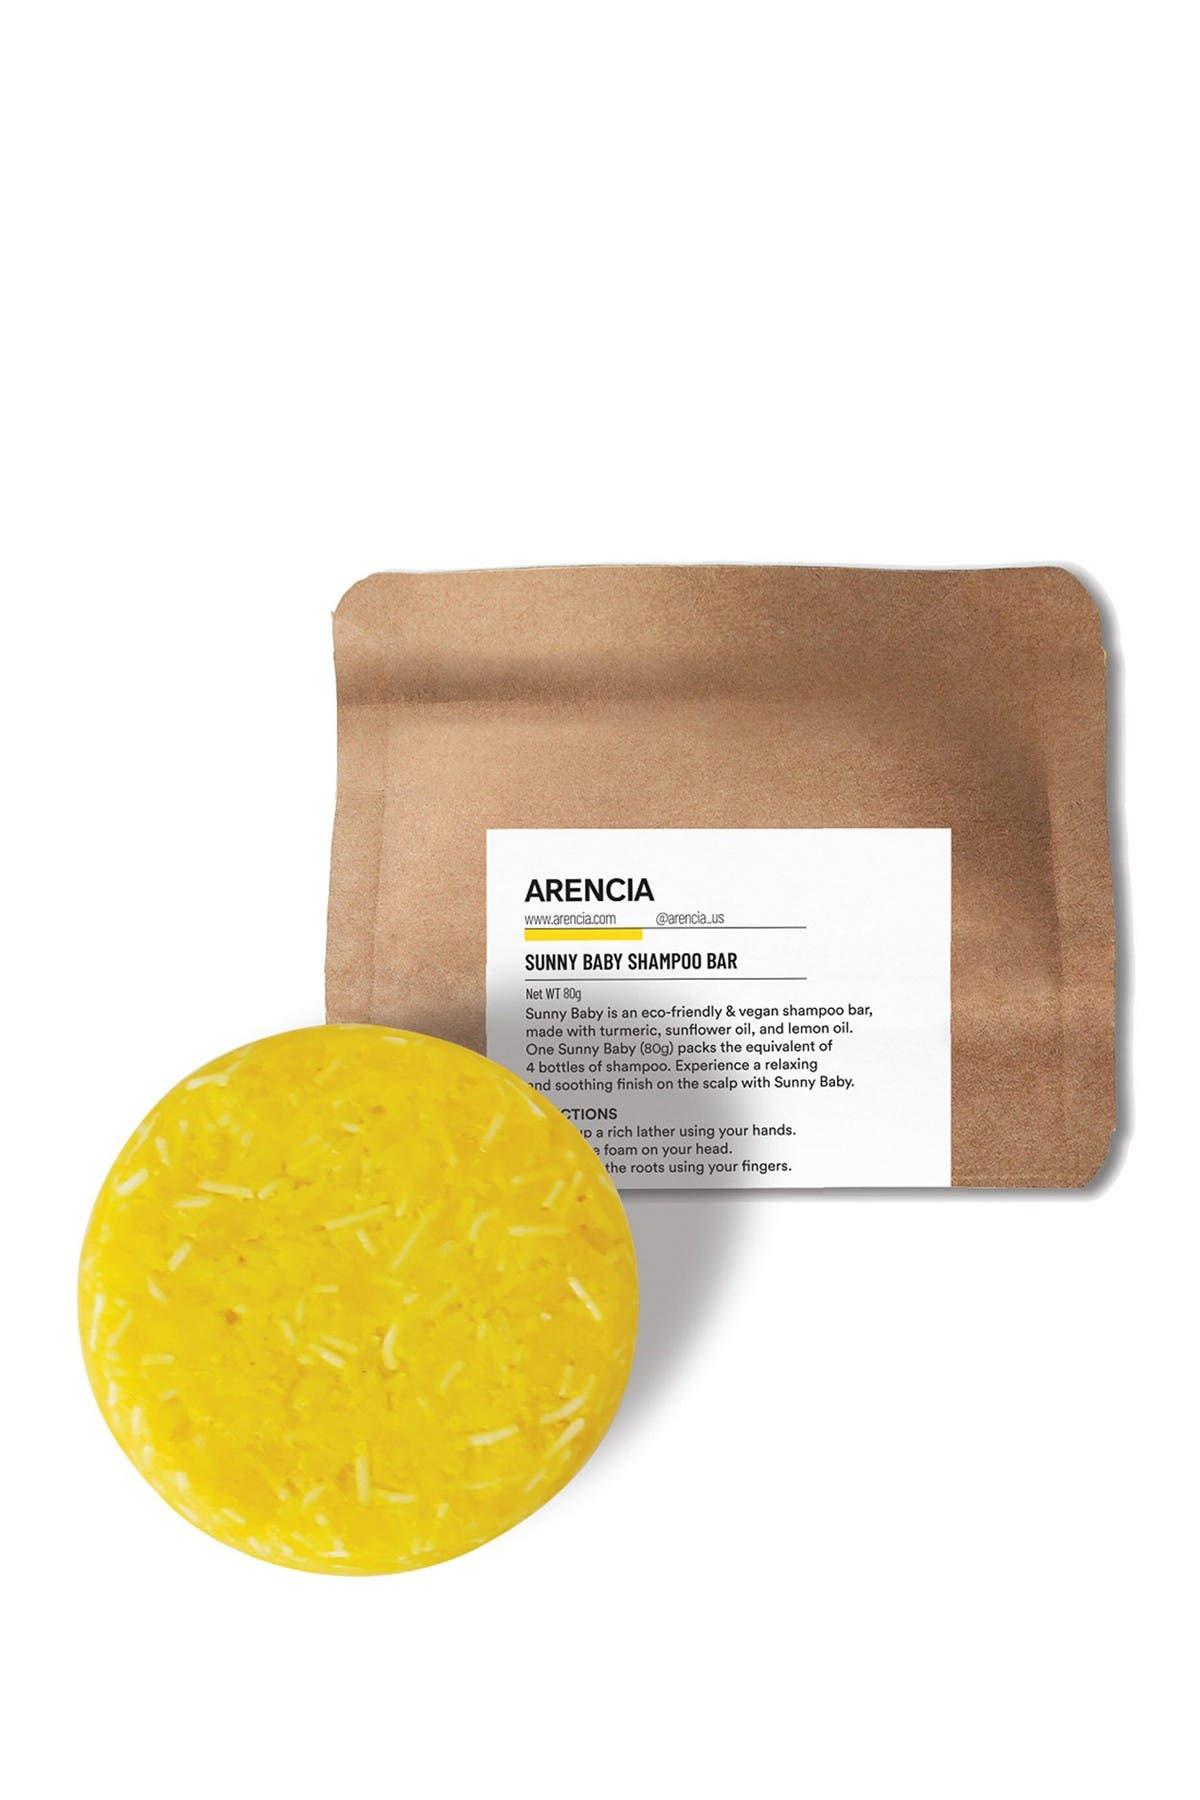 Image of Arencia Sunny Baby Shampoo Bar